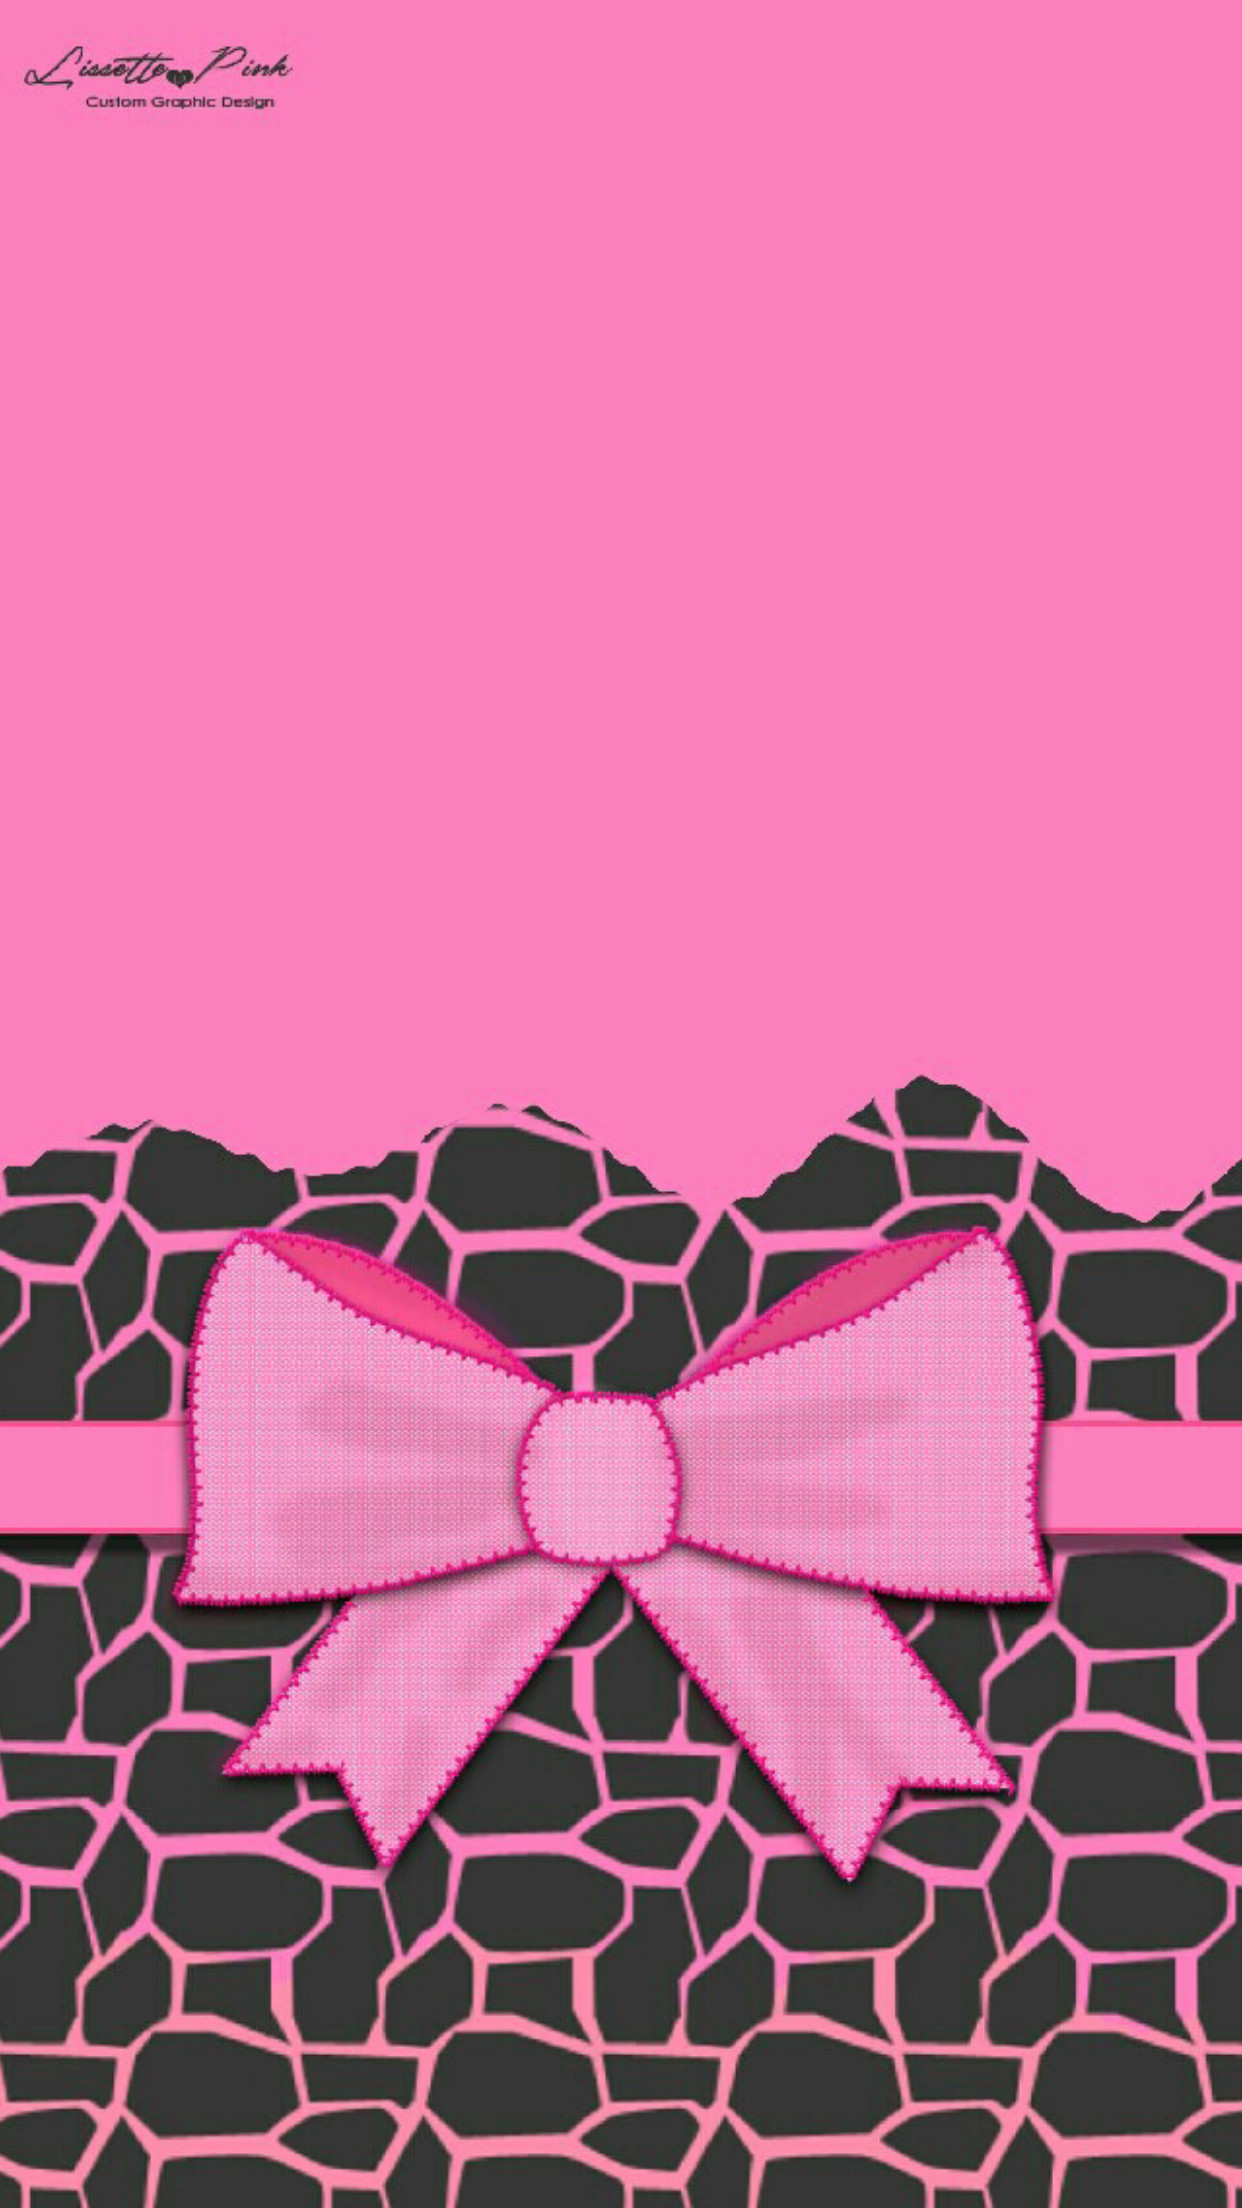 Cool Wallpaper Hello Kitty Girly - 149516  Trends_289864.jpg